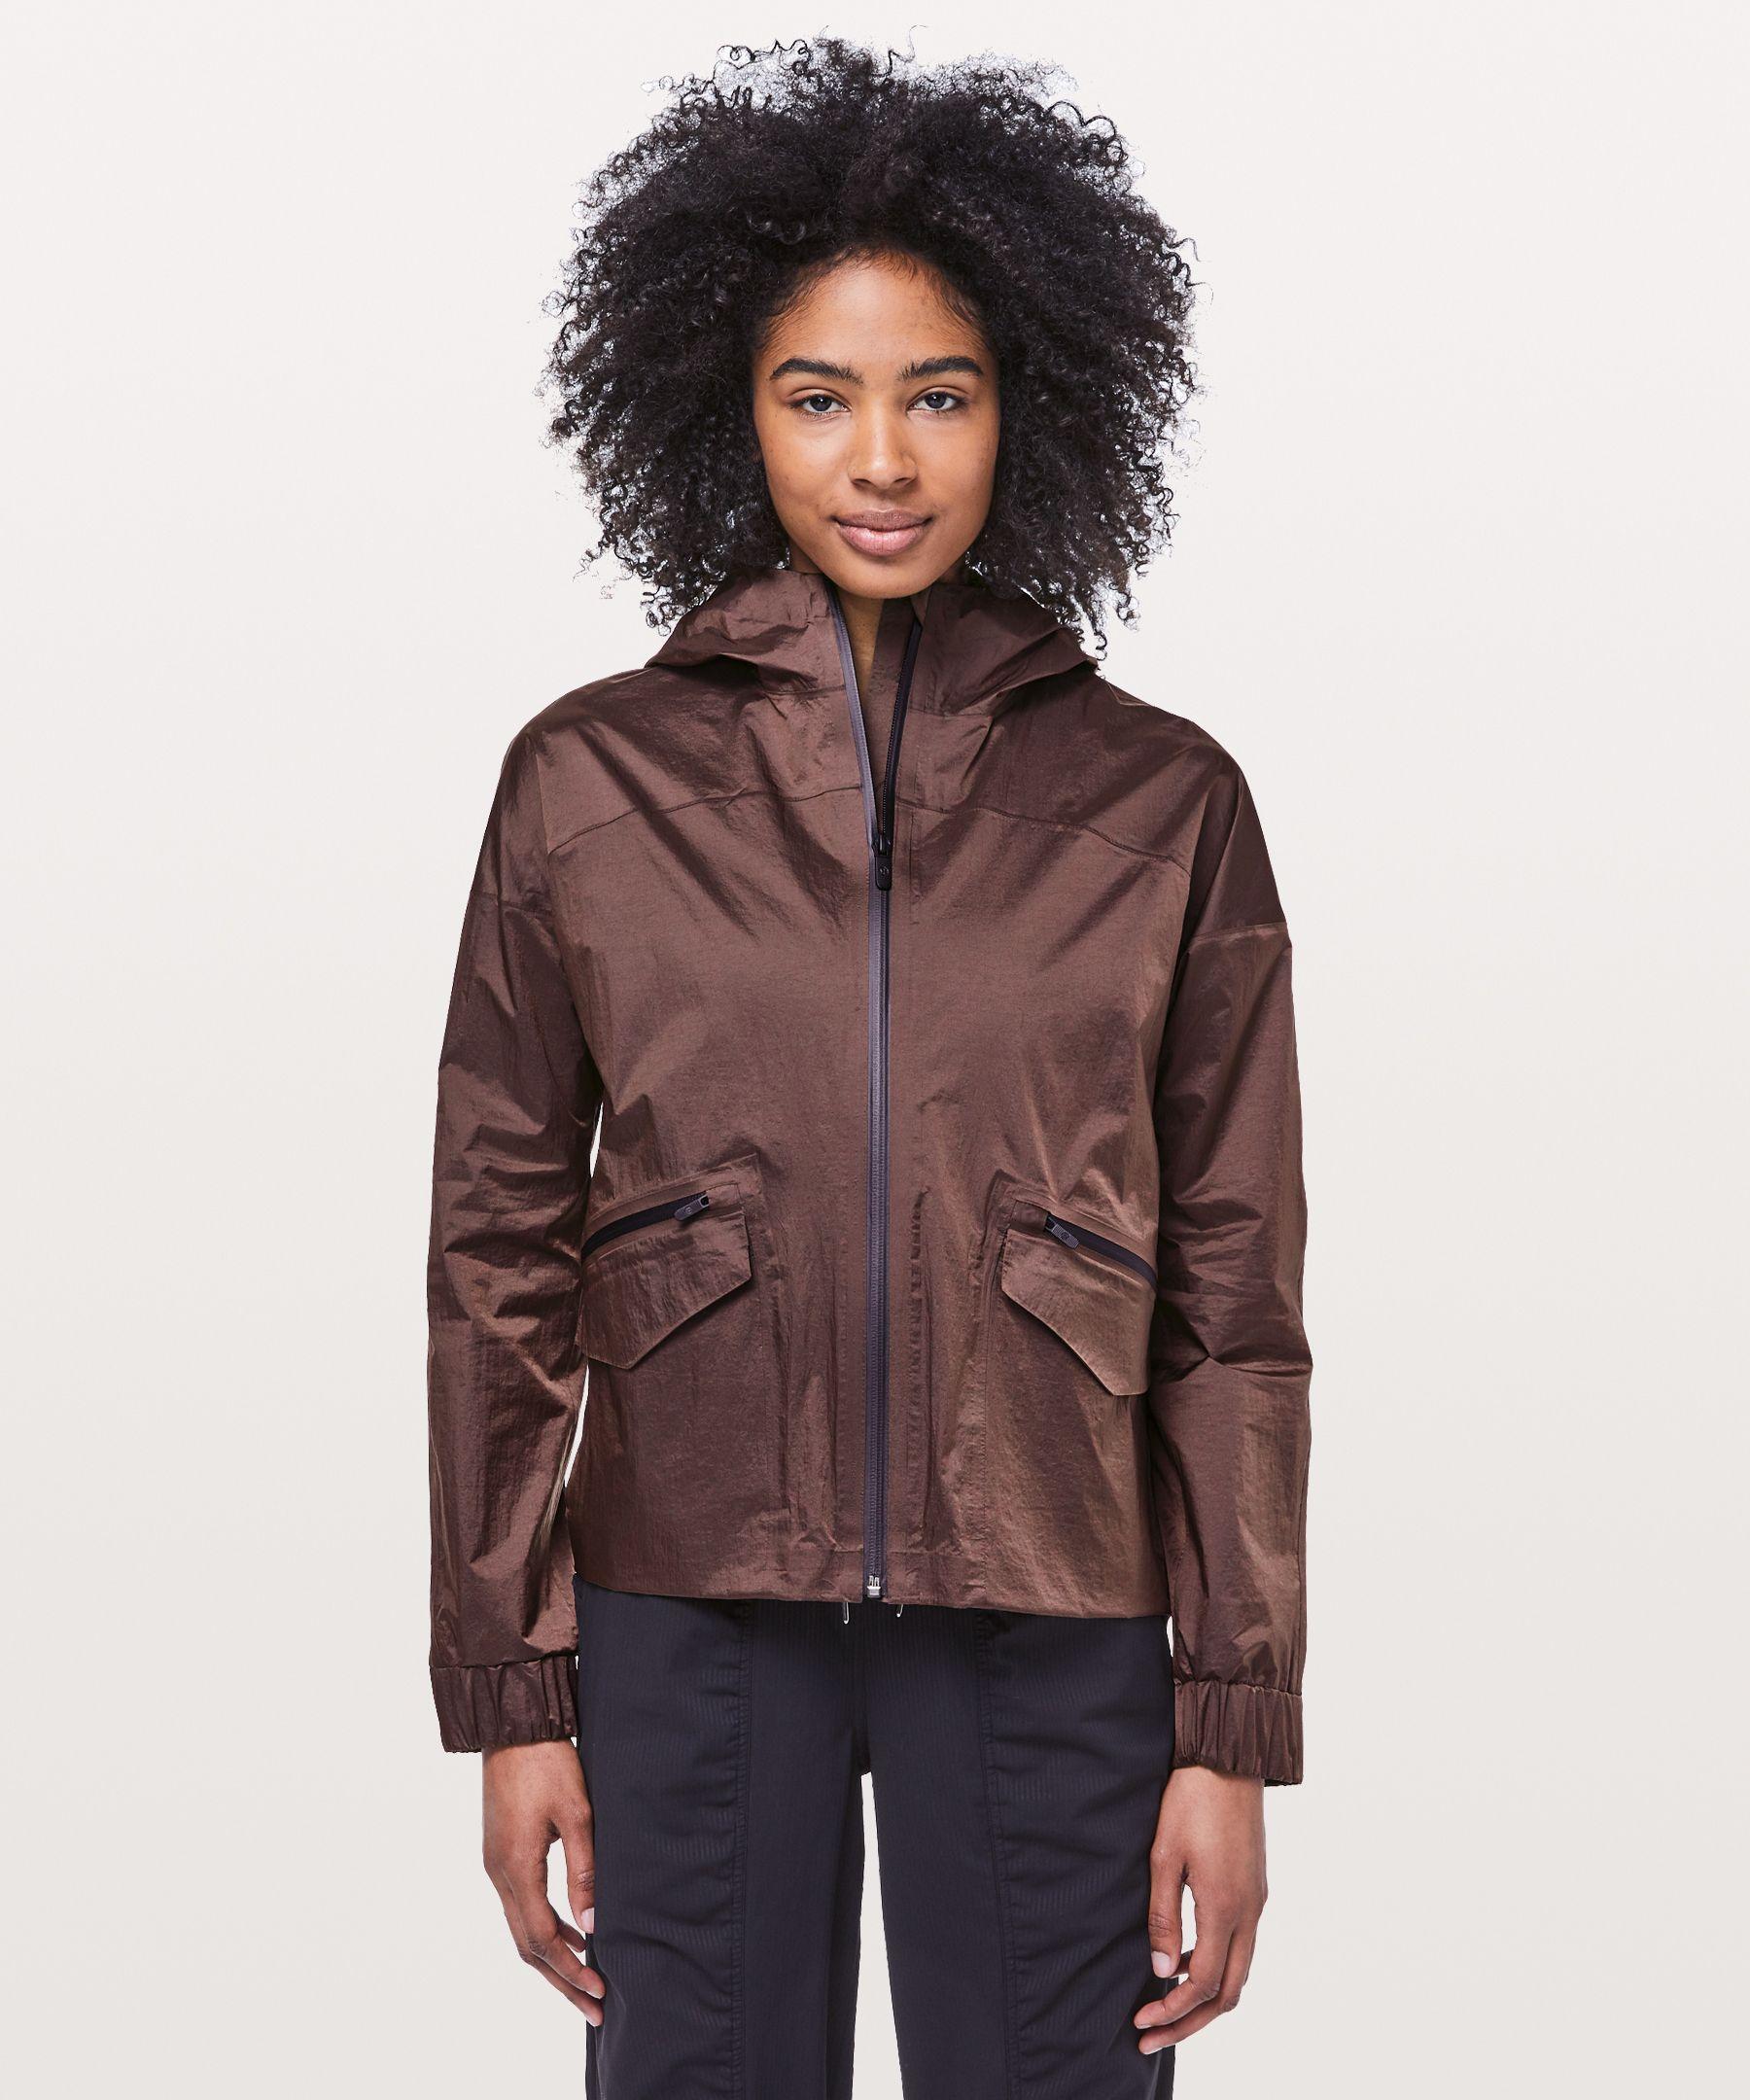 Lululemon Drizzle Down Jacket In Purple Taupe/black